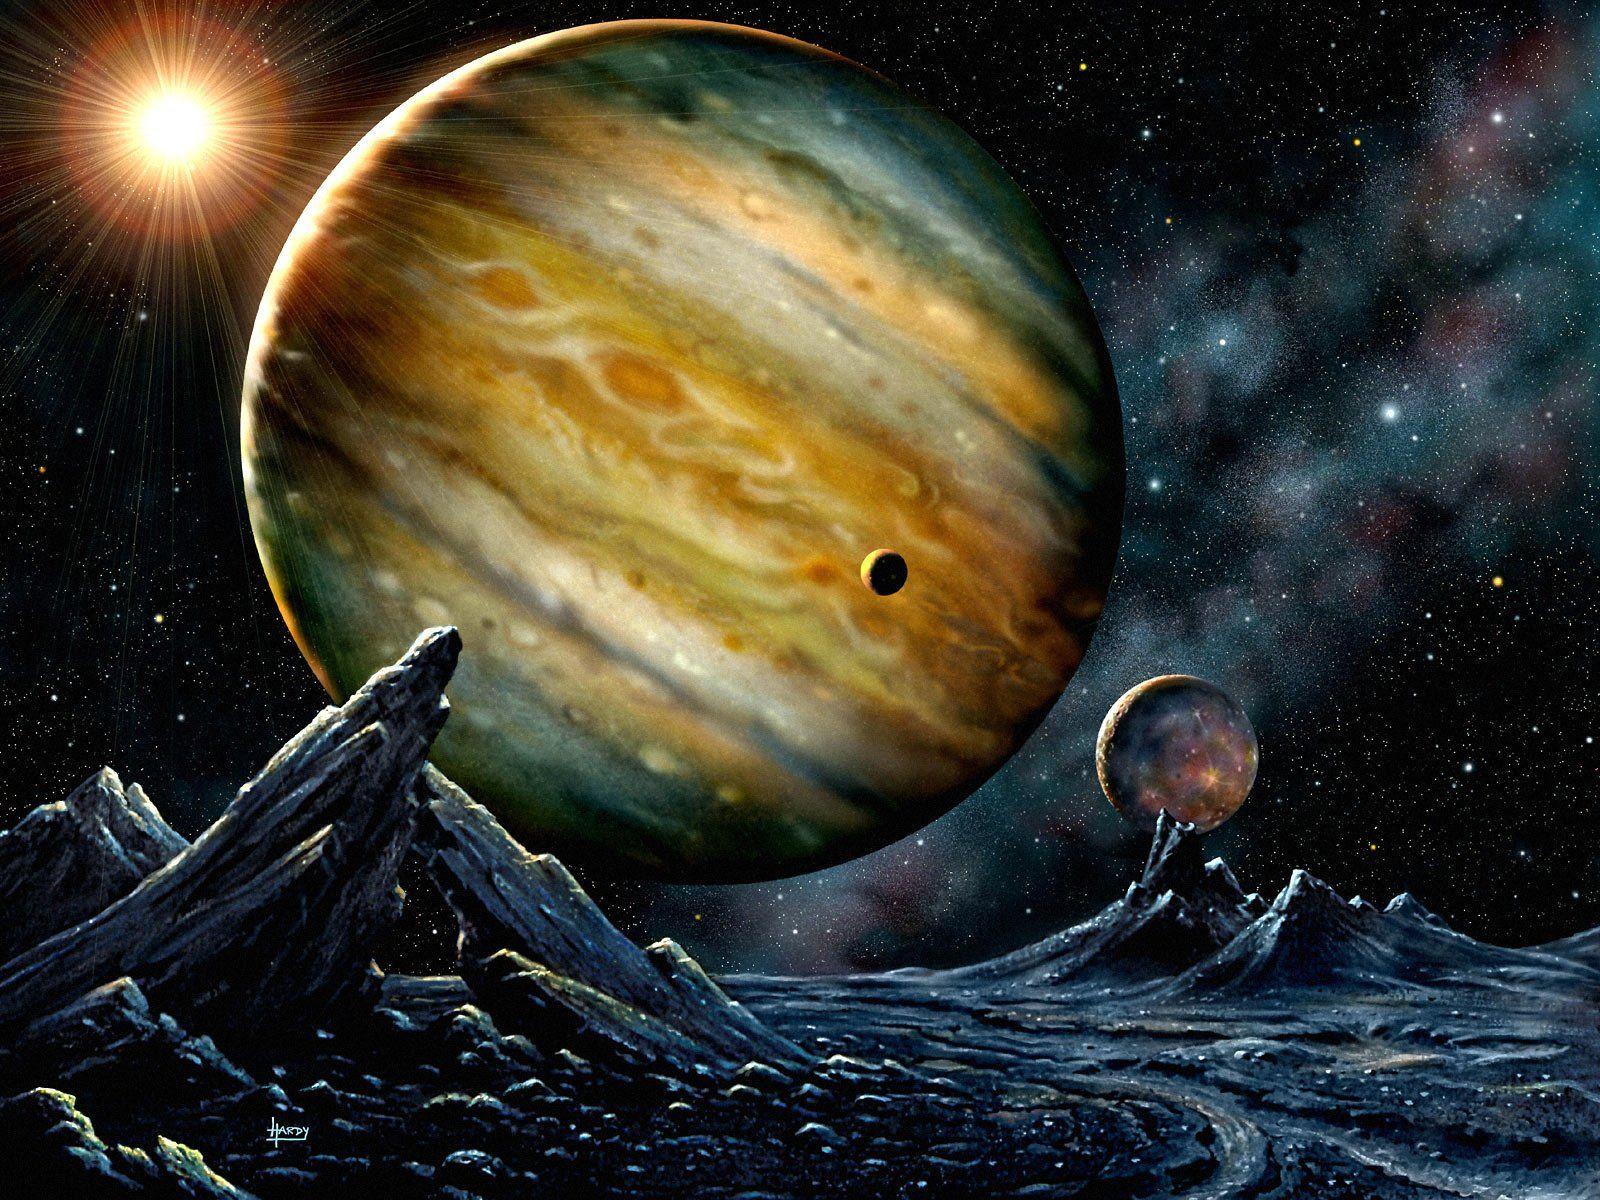 картинки космос планета юпитер положение дивана